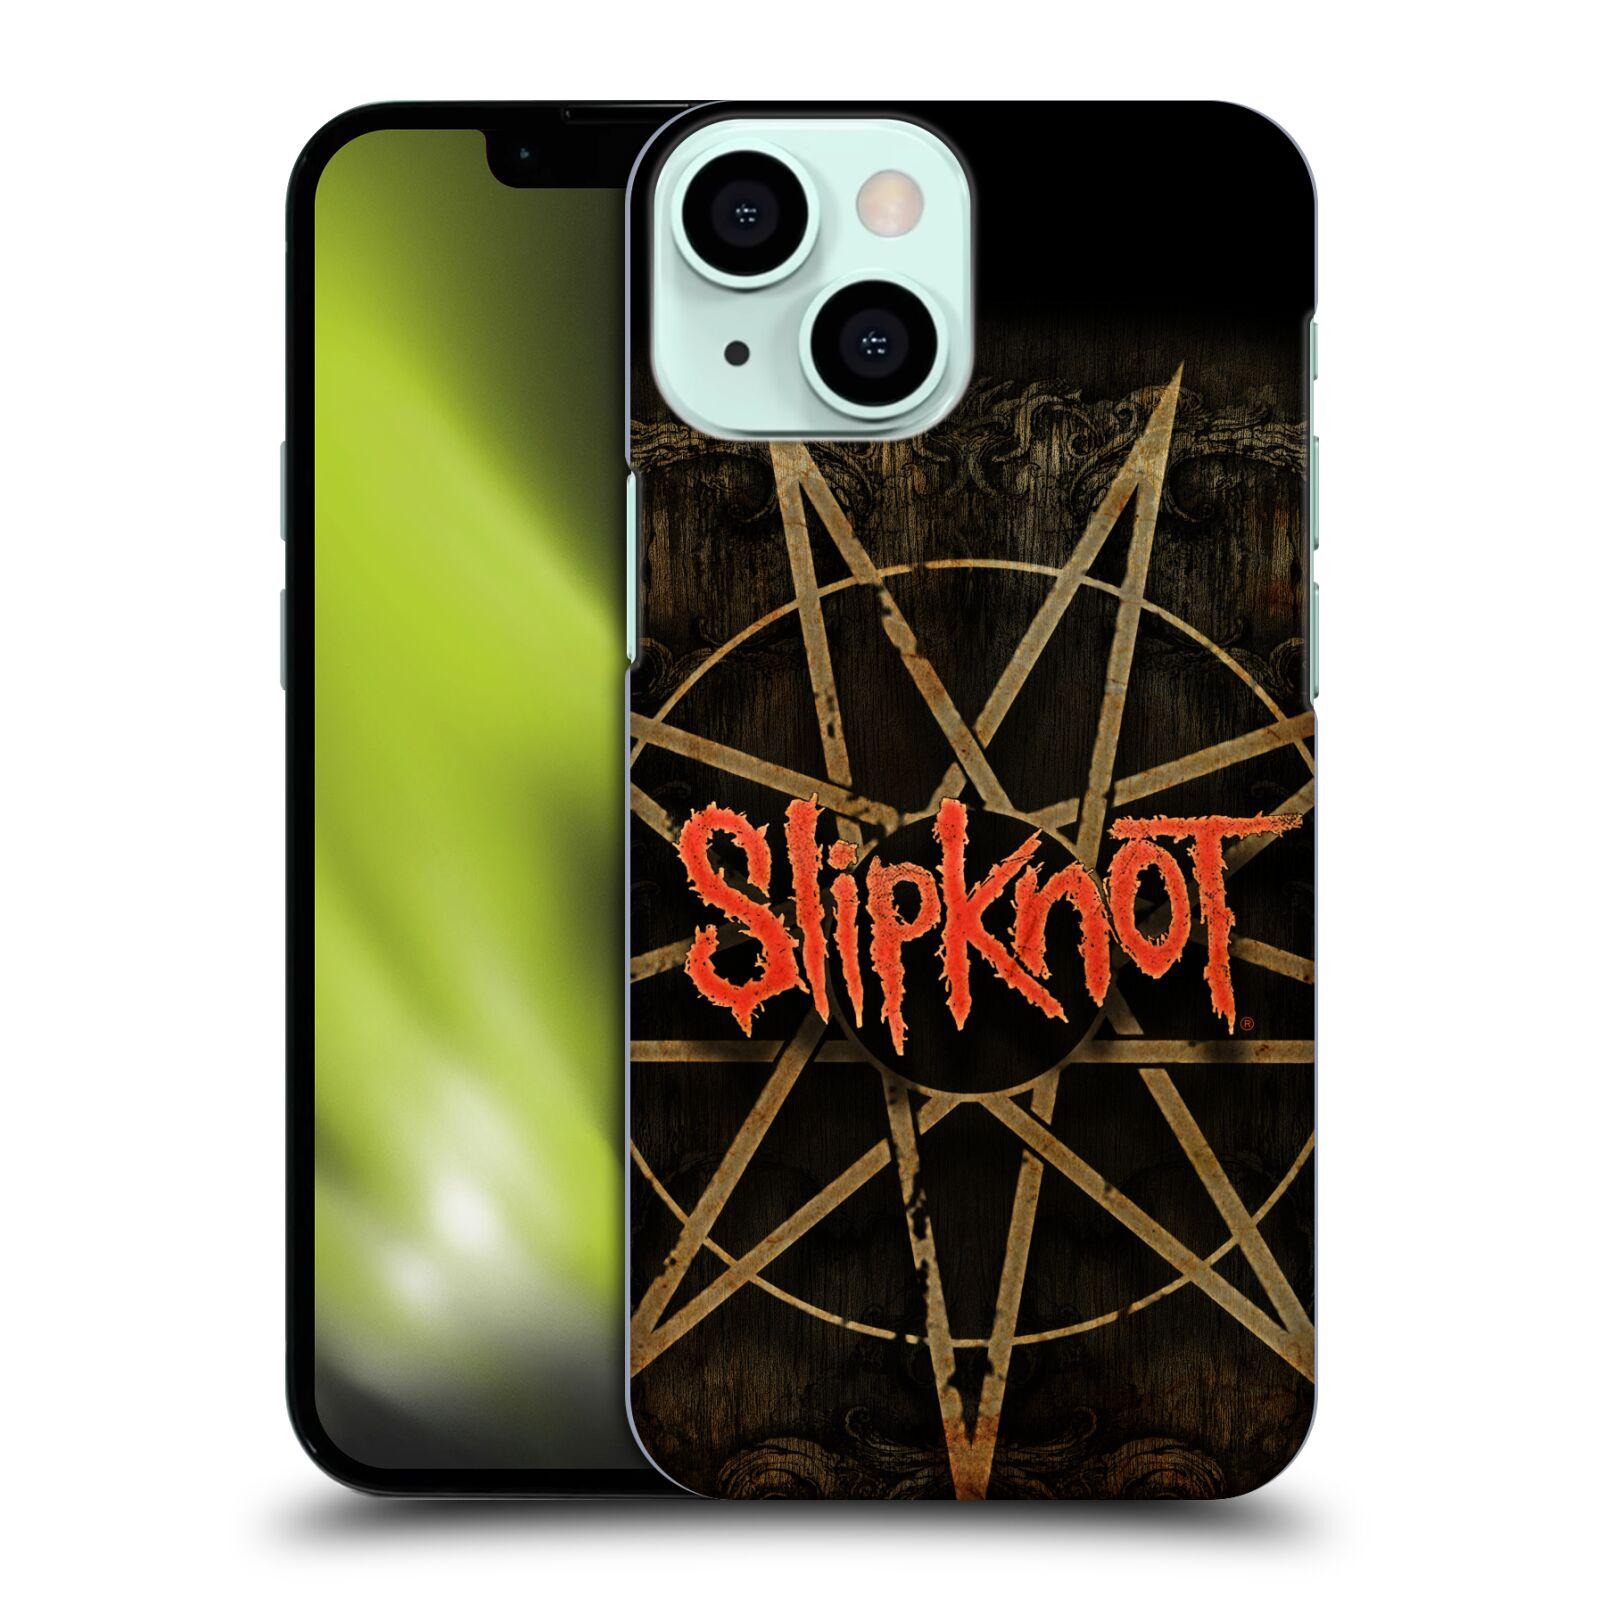 Plastové pouzdro na mobil Apple iPhone 13 Mini - Head Case - Slipknot - Znak